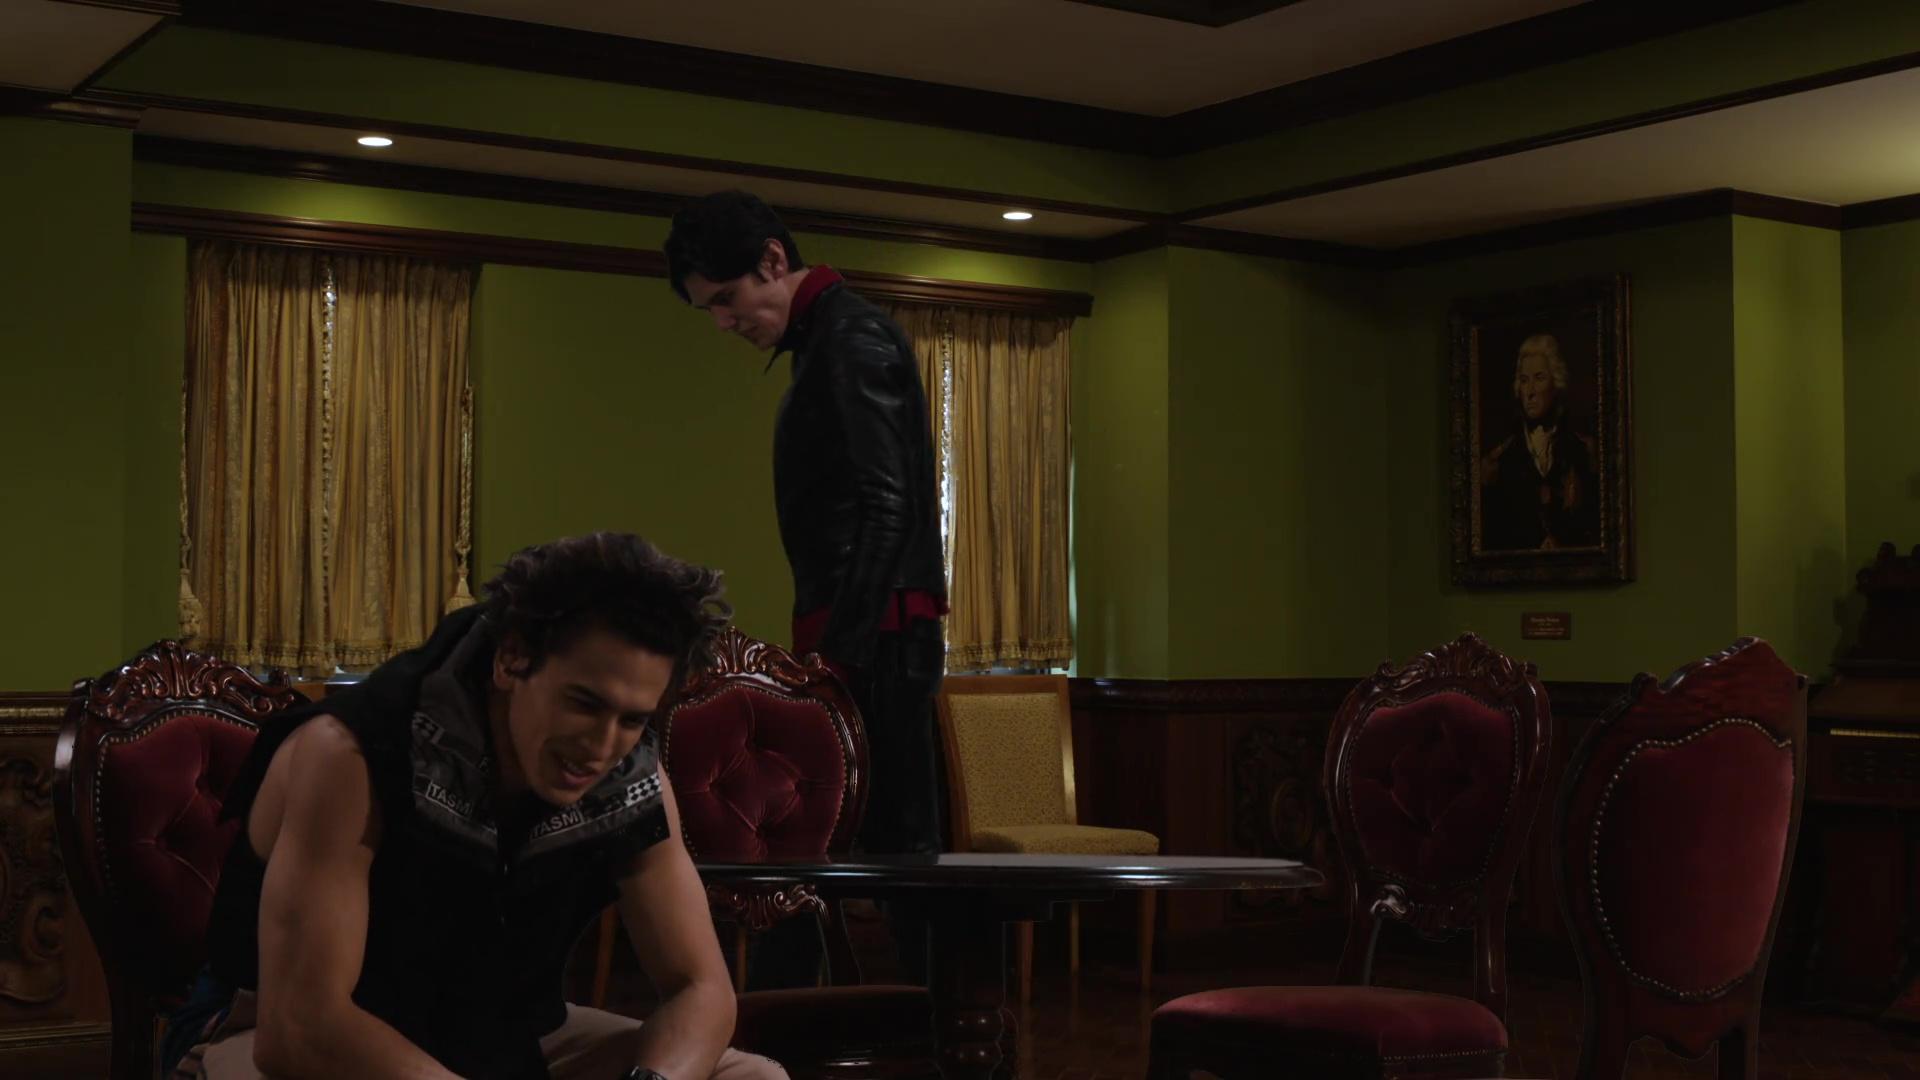 Kamen Rider Saber Episode 19 Recap